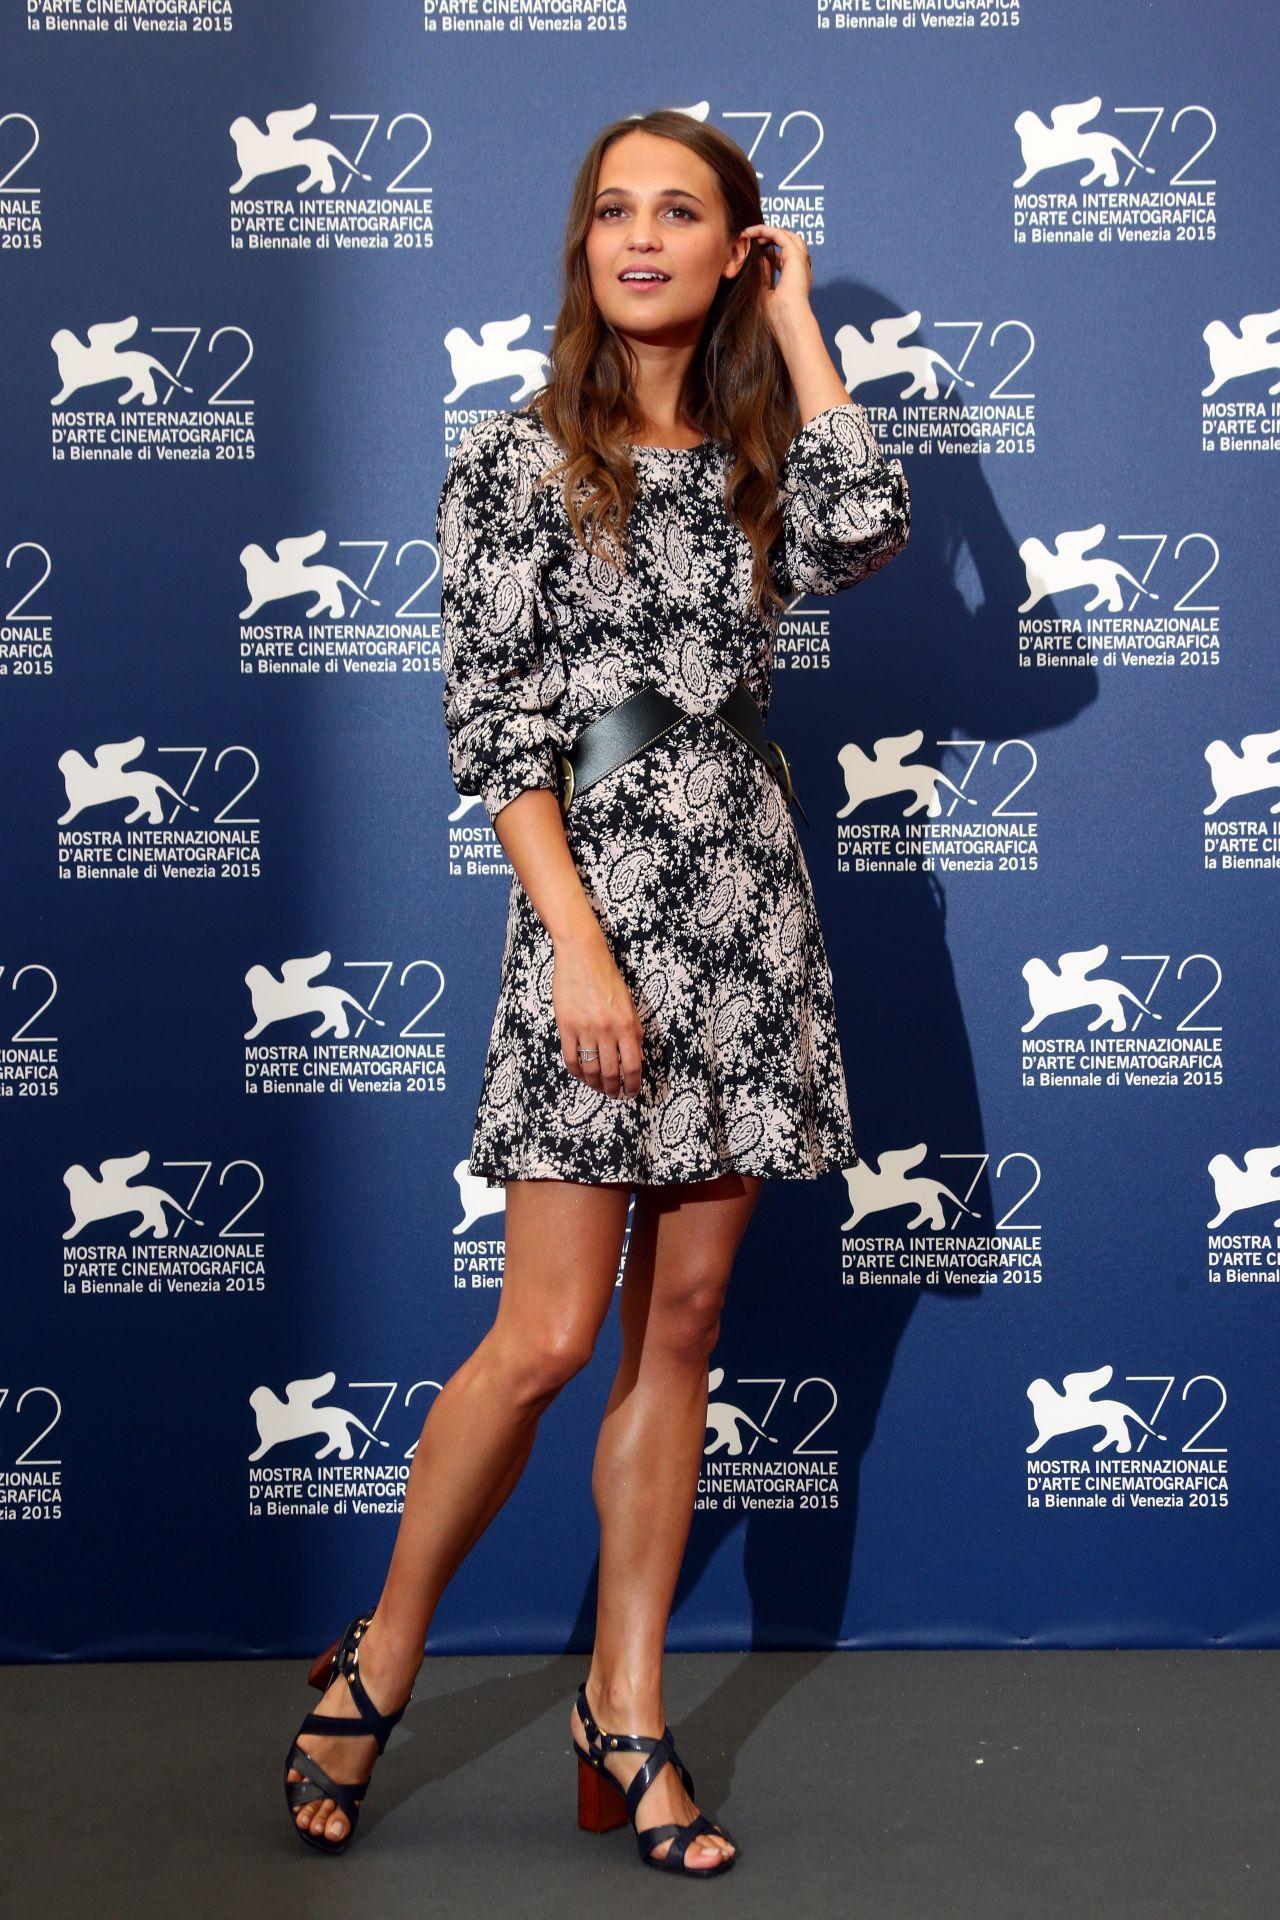 Alicia Vikander The Danish Girl Photocall 72nd